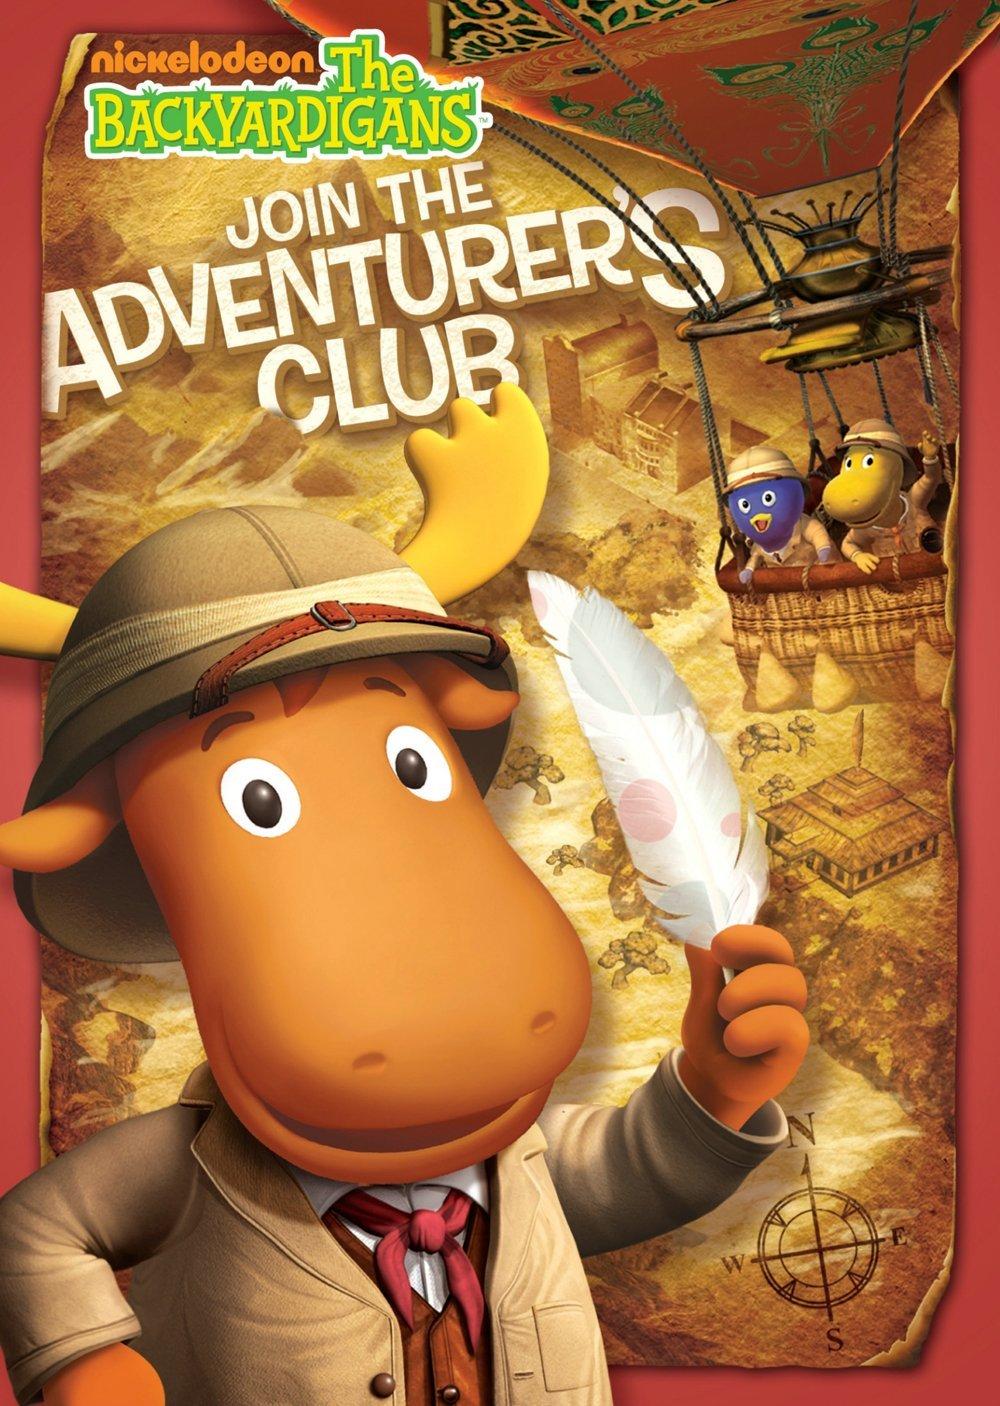 Join the Adventurer's Club | The Backyardigans Wiki | FANDOM